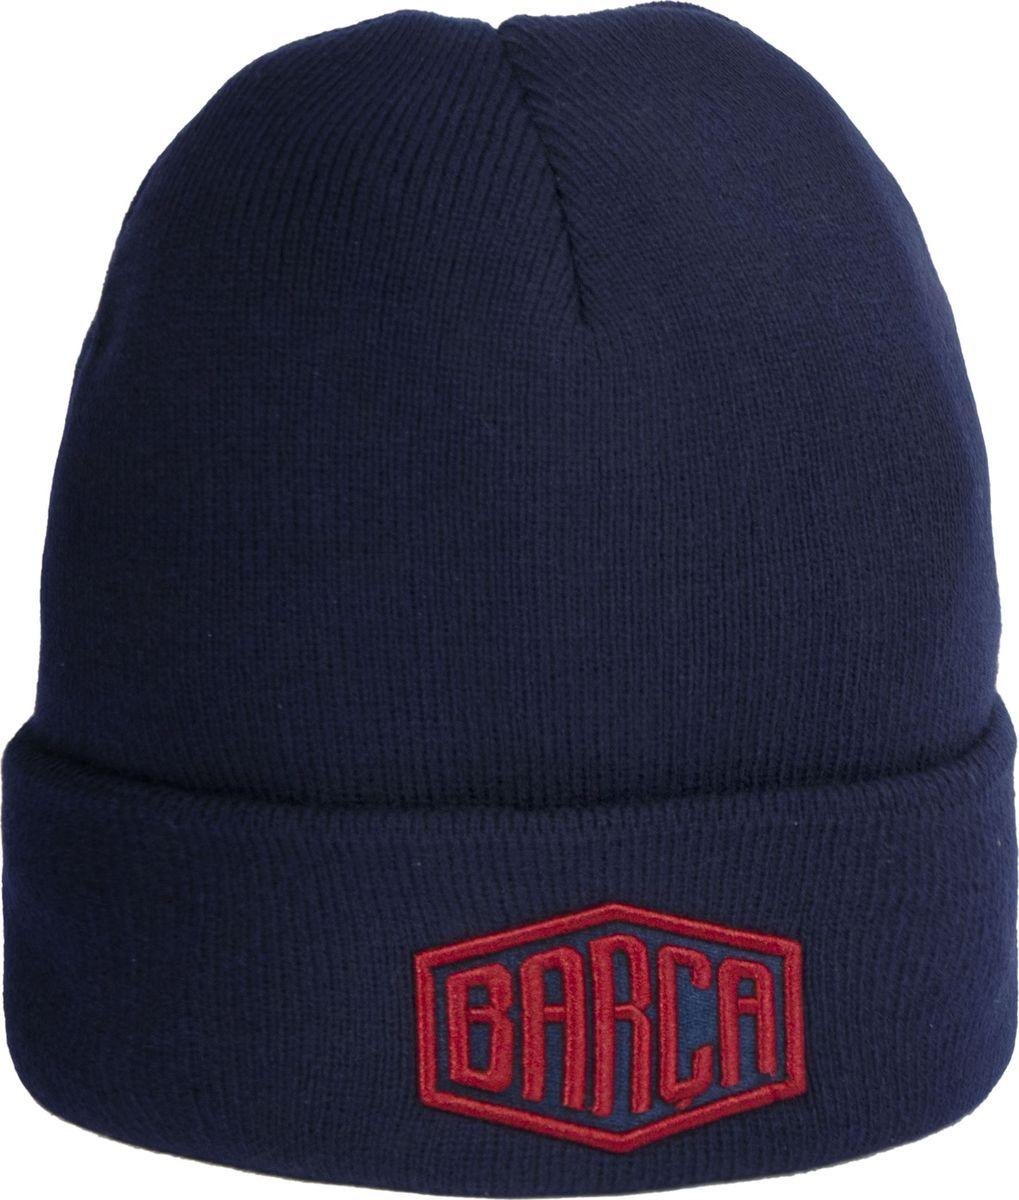 Шапка мужская Atributika & Club Barcelona, цвет: темно-синий. 115119. Размер 55/58